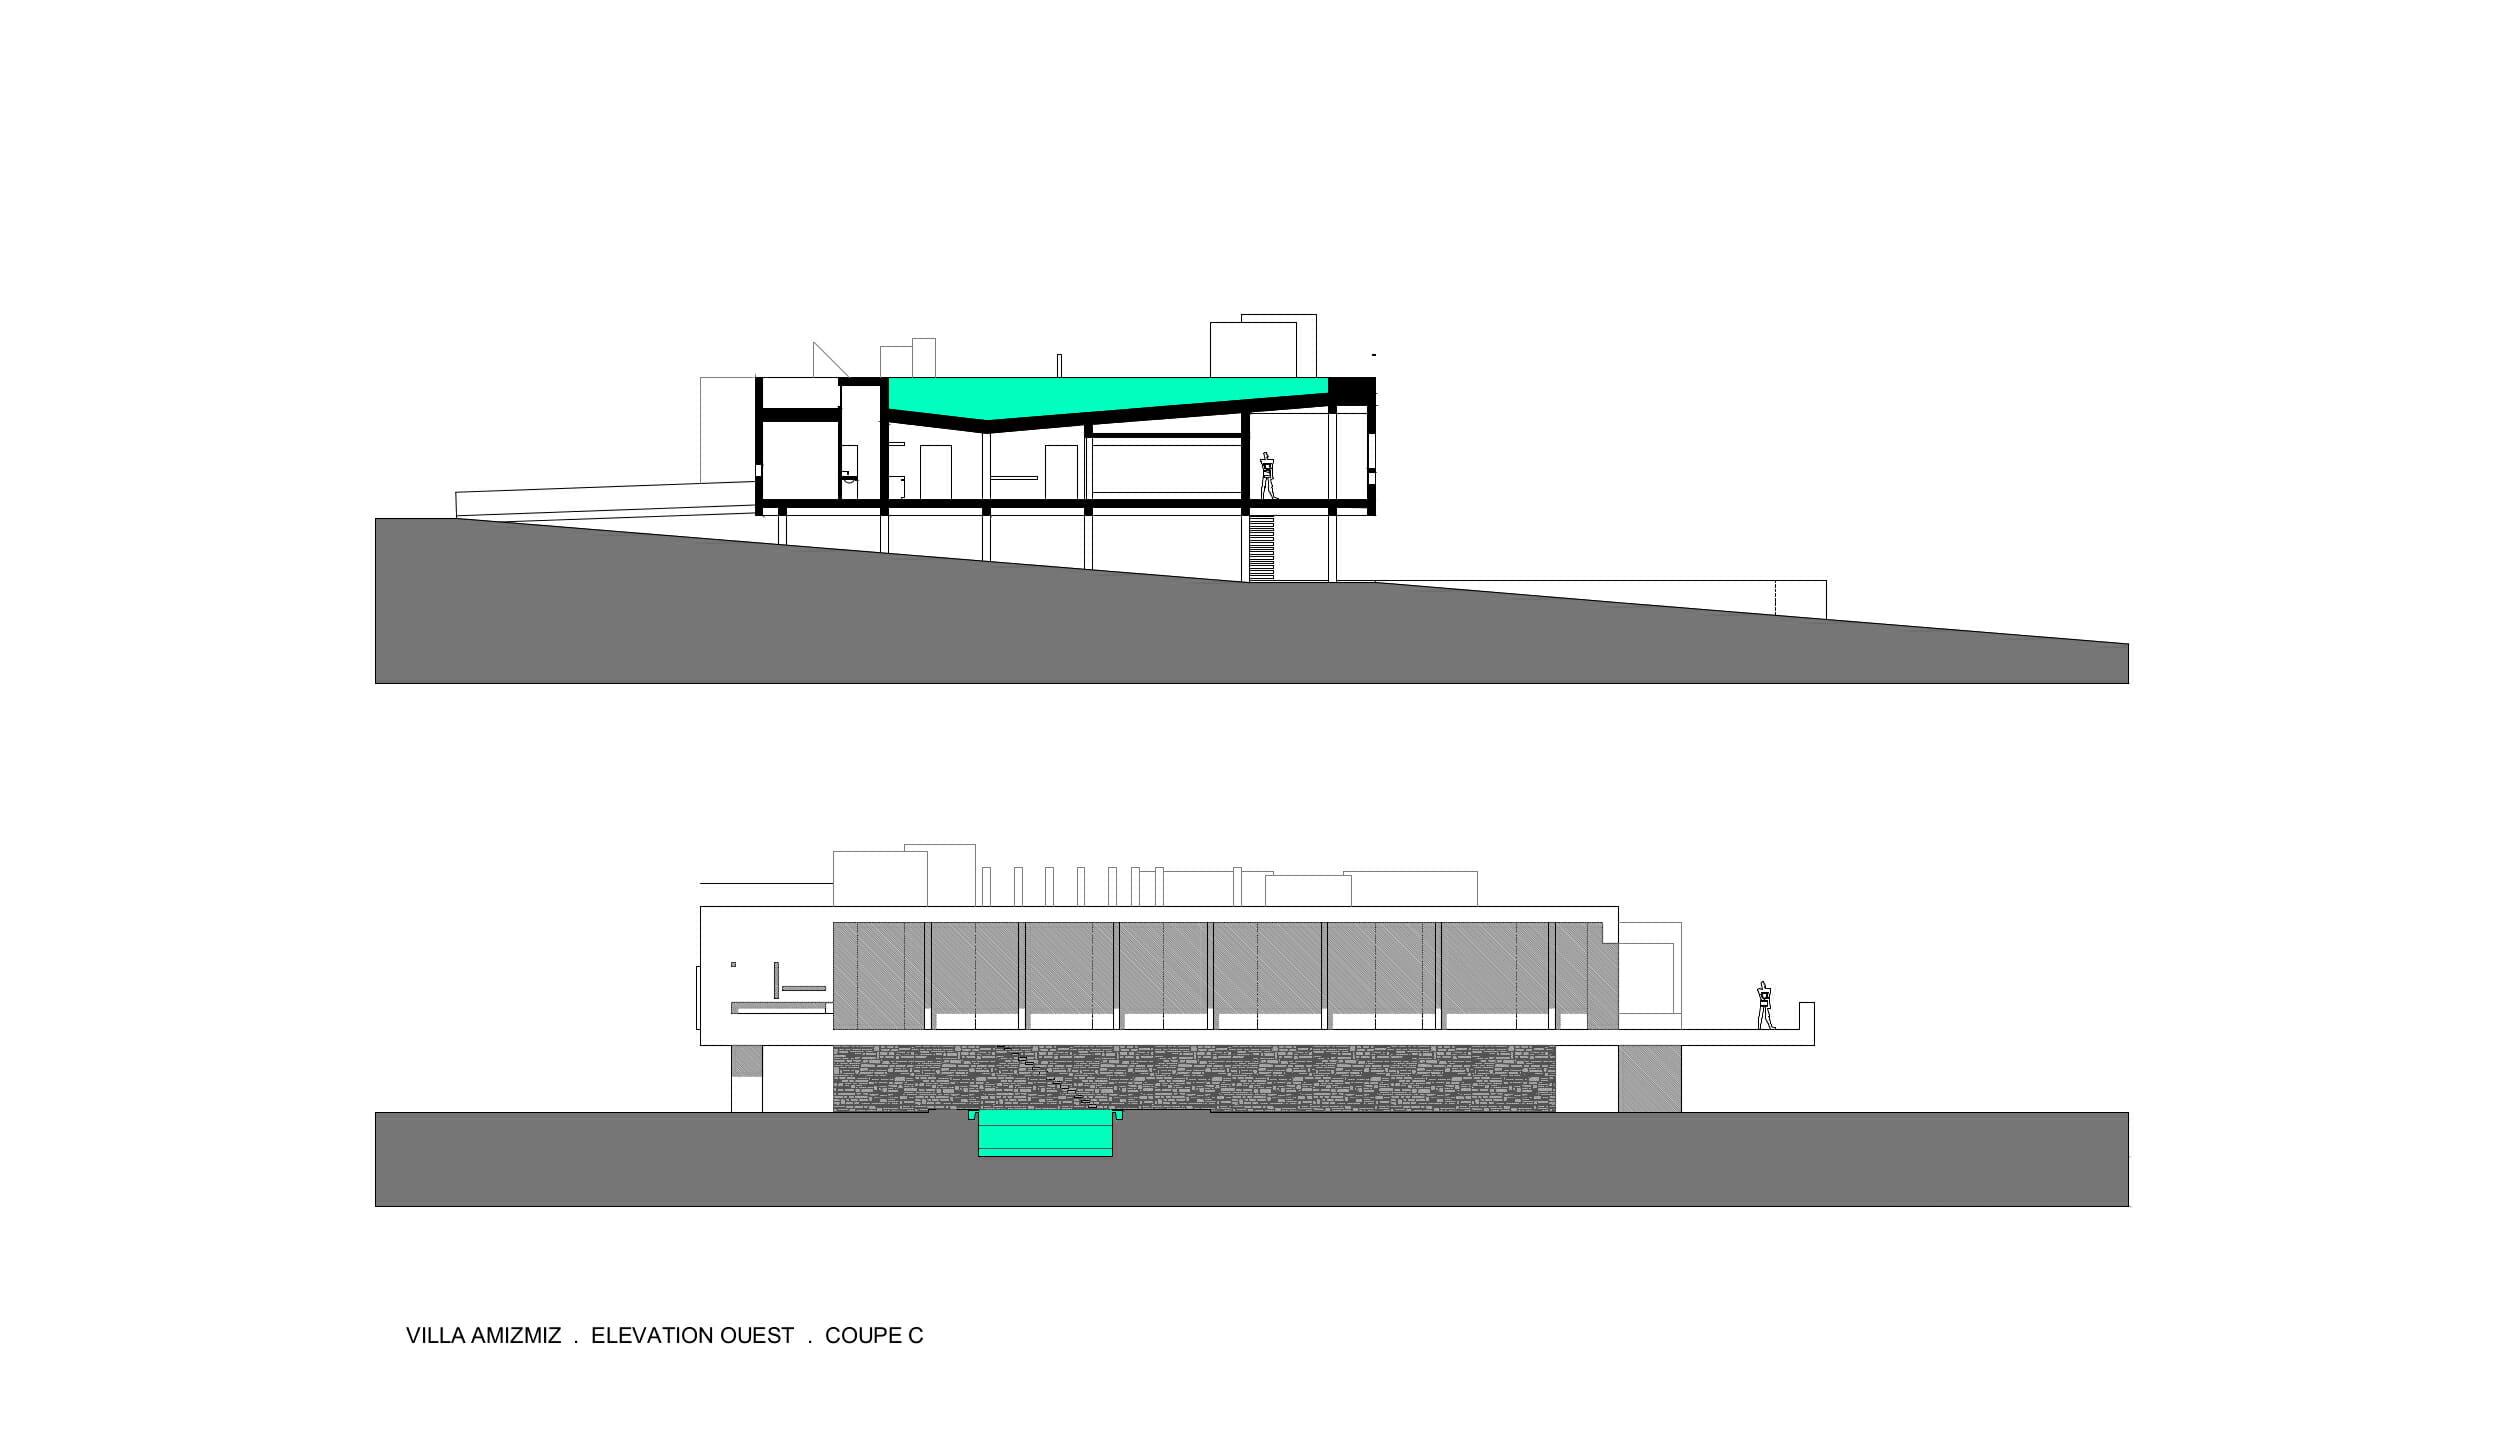 AMIZMIZ.plan-03-cp-el-3